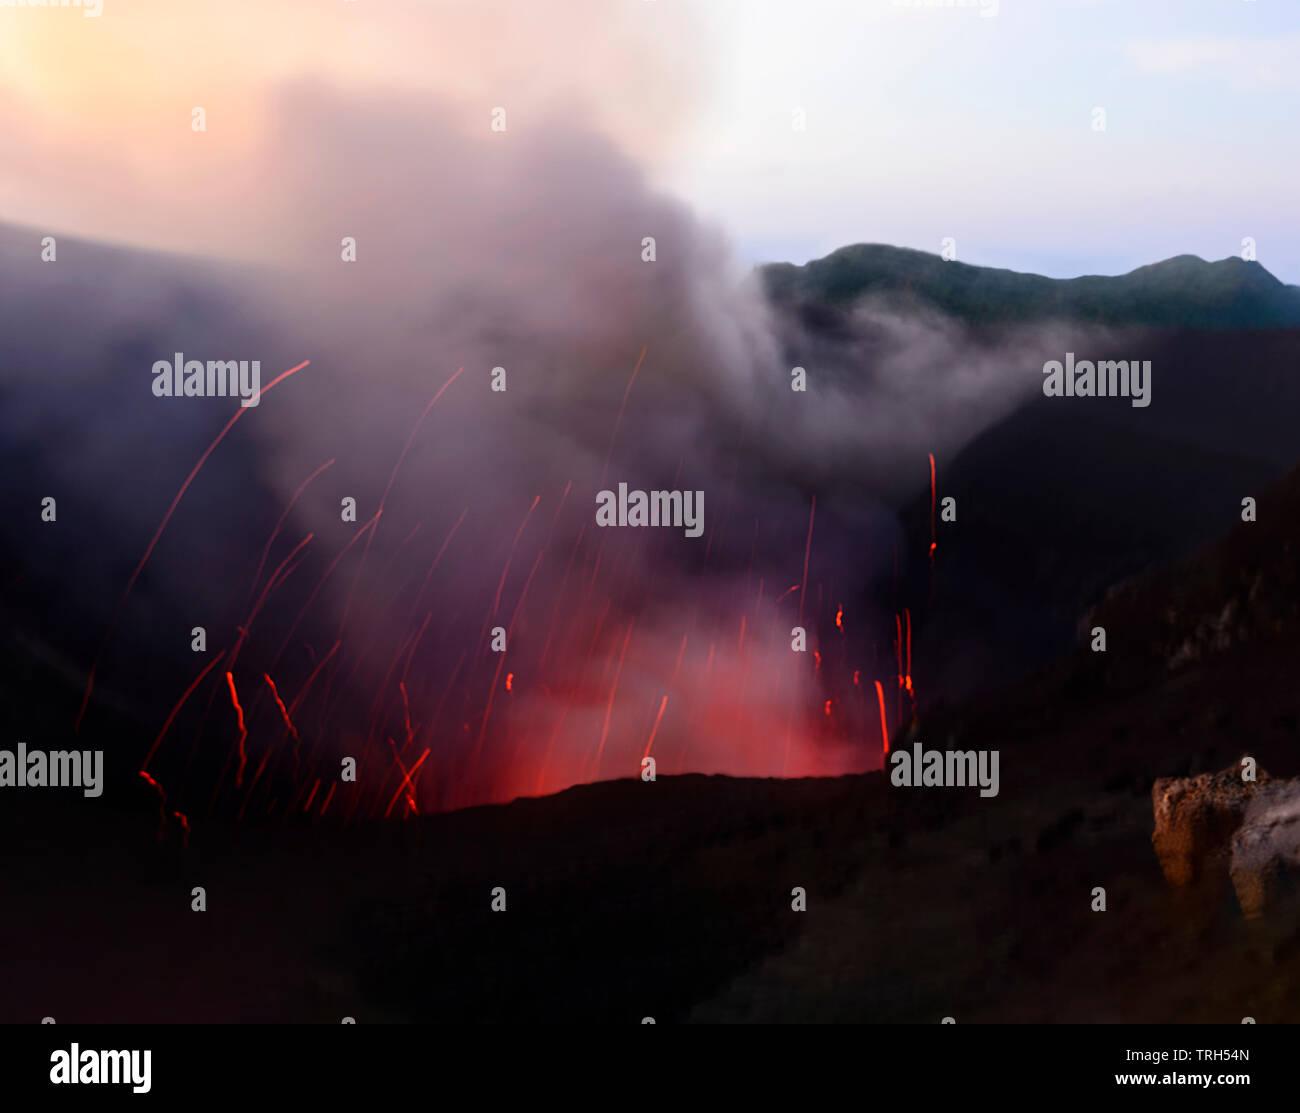 Glowing Lava, fumaroles, hot gases and sparks at erupting Mt Yasur Volcano, Tanna Island, Vanuatu - Stock Image